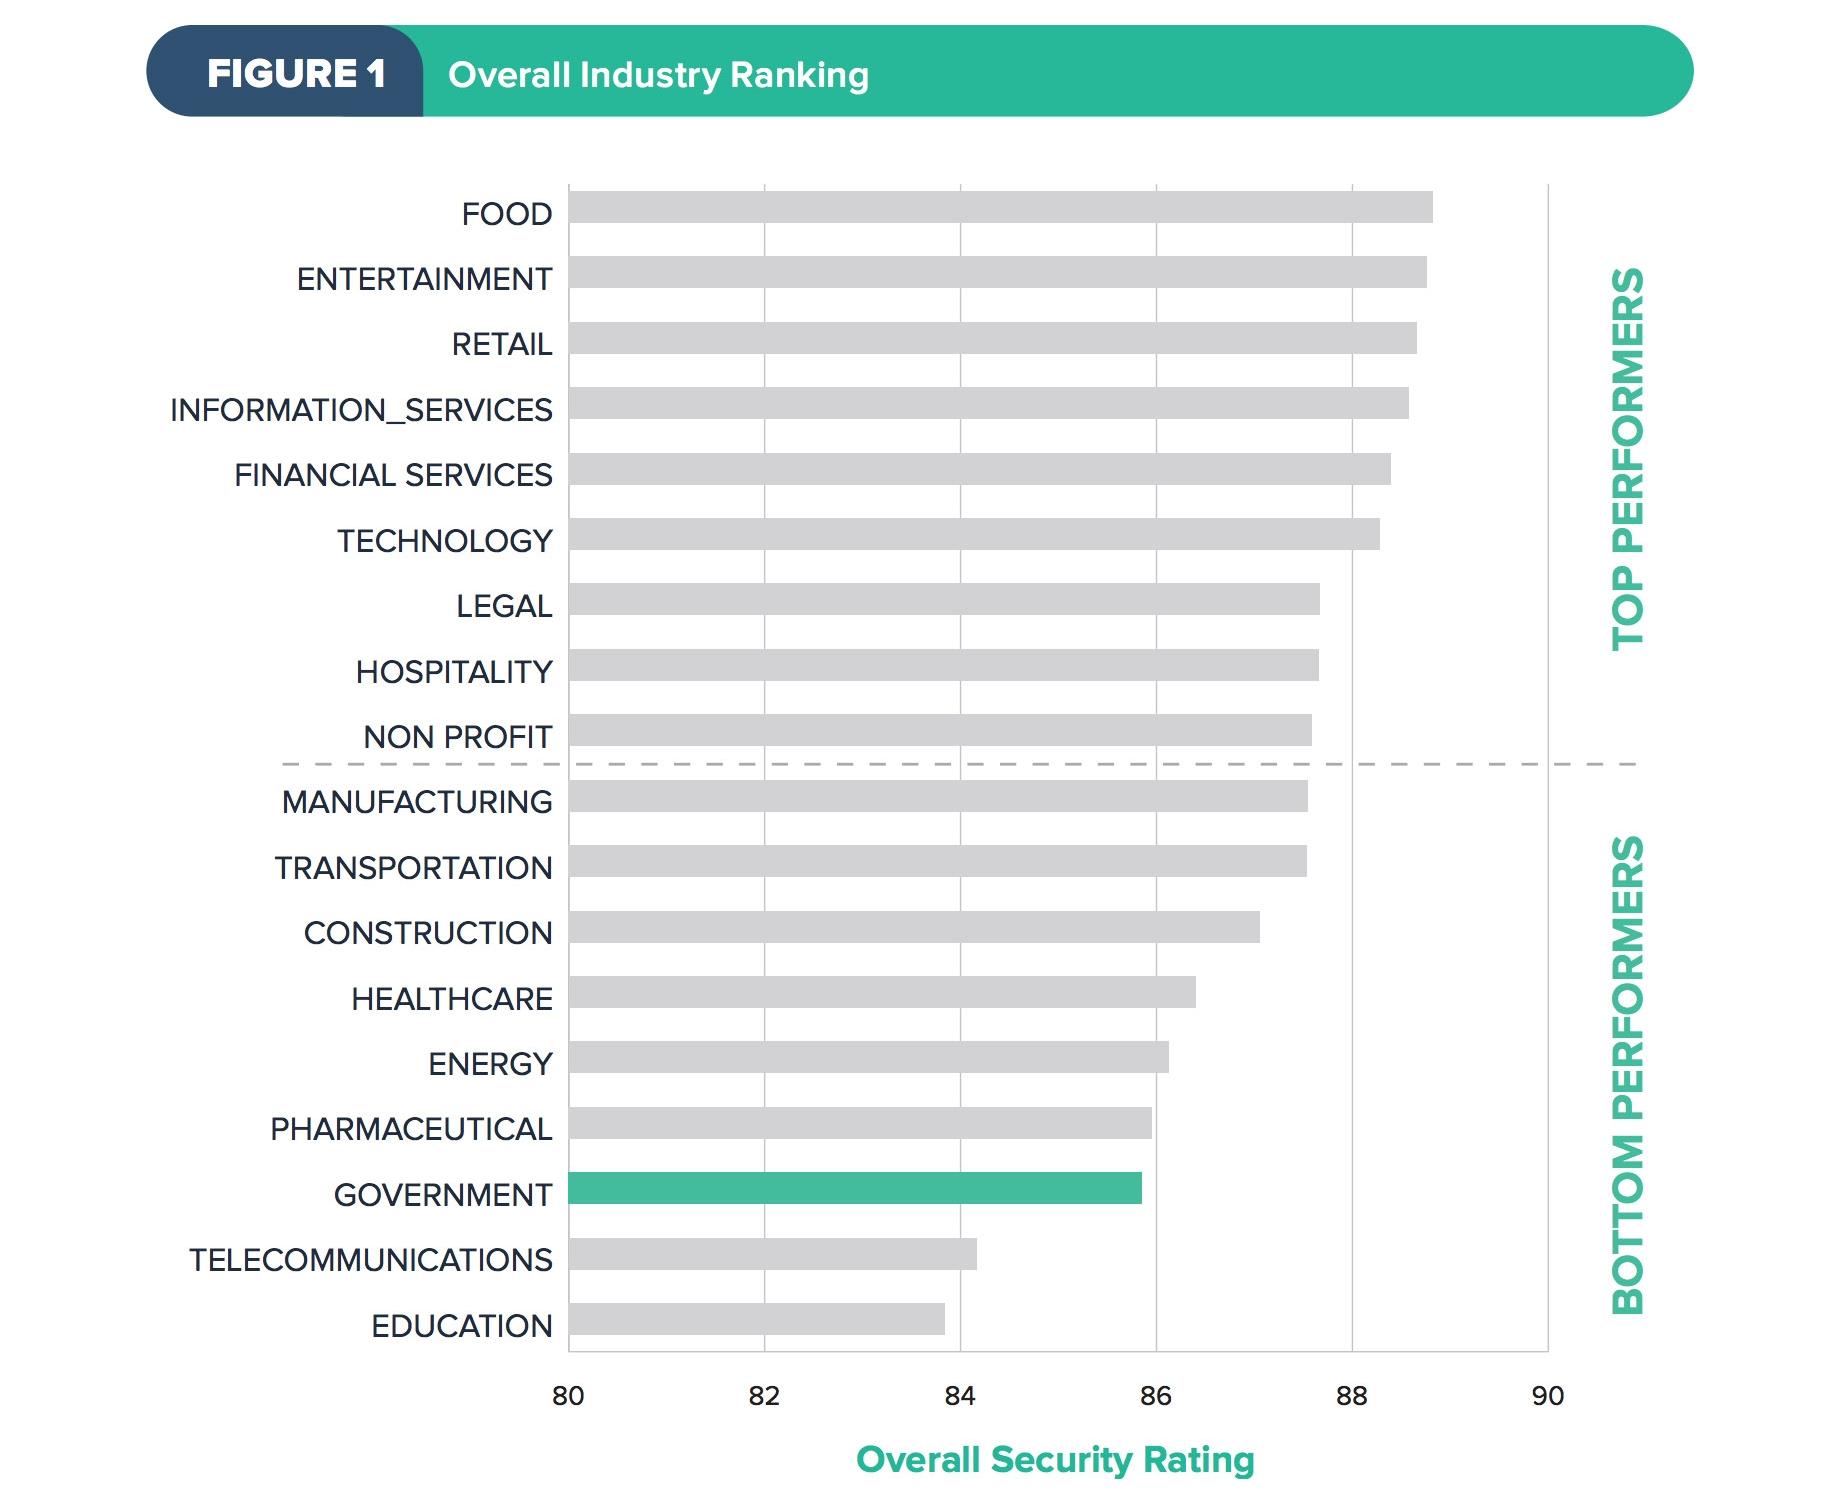 Source: https://cdn2.hubspot.net/hubfs/533449/Images/SecurityScorecard%202017%20Govt%20Cybersecurity%20Report.pdf